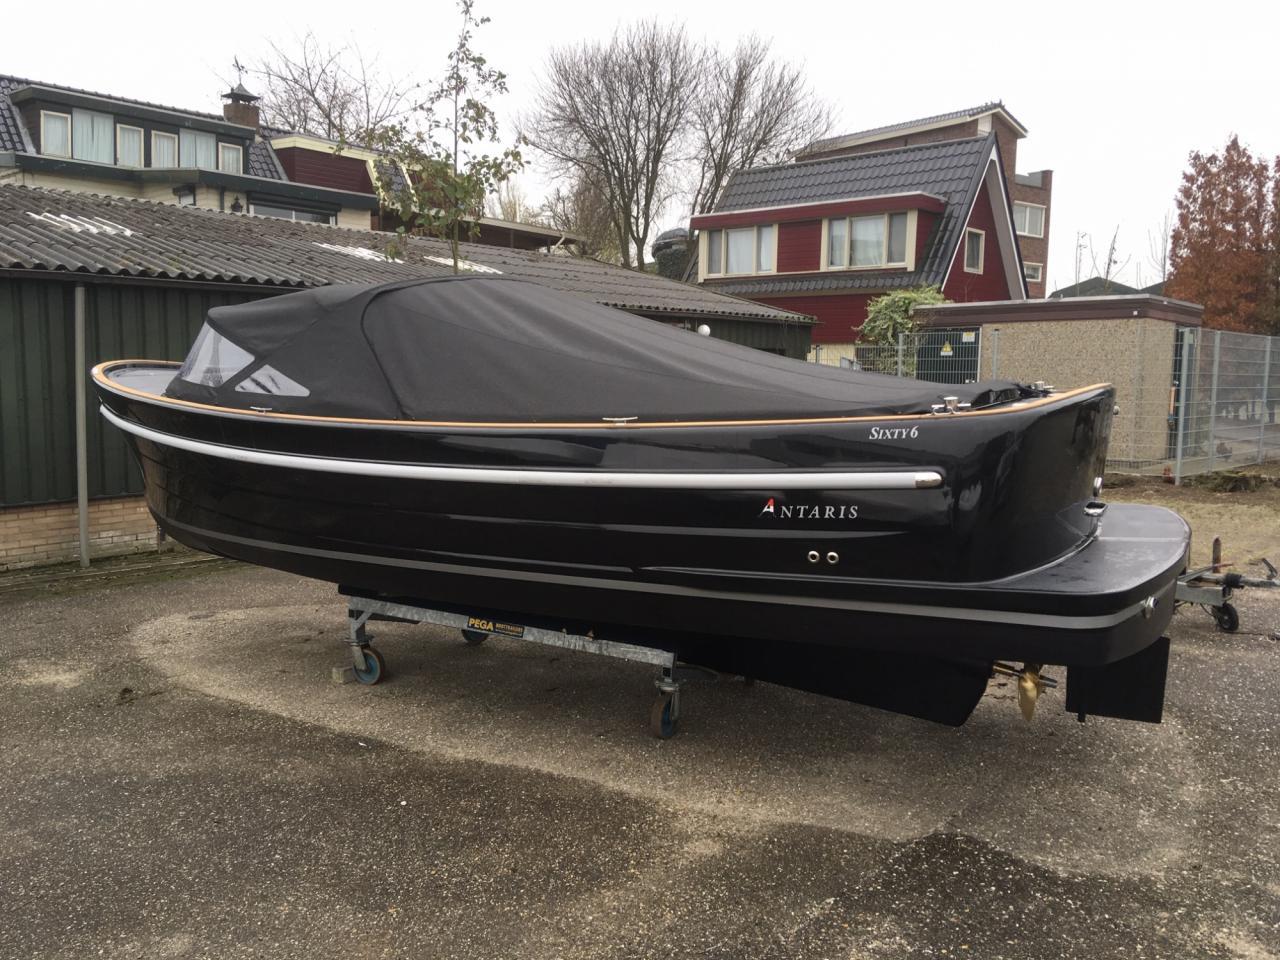 Antaris Sixty6 zwart met 52 pk  6